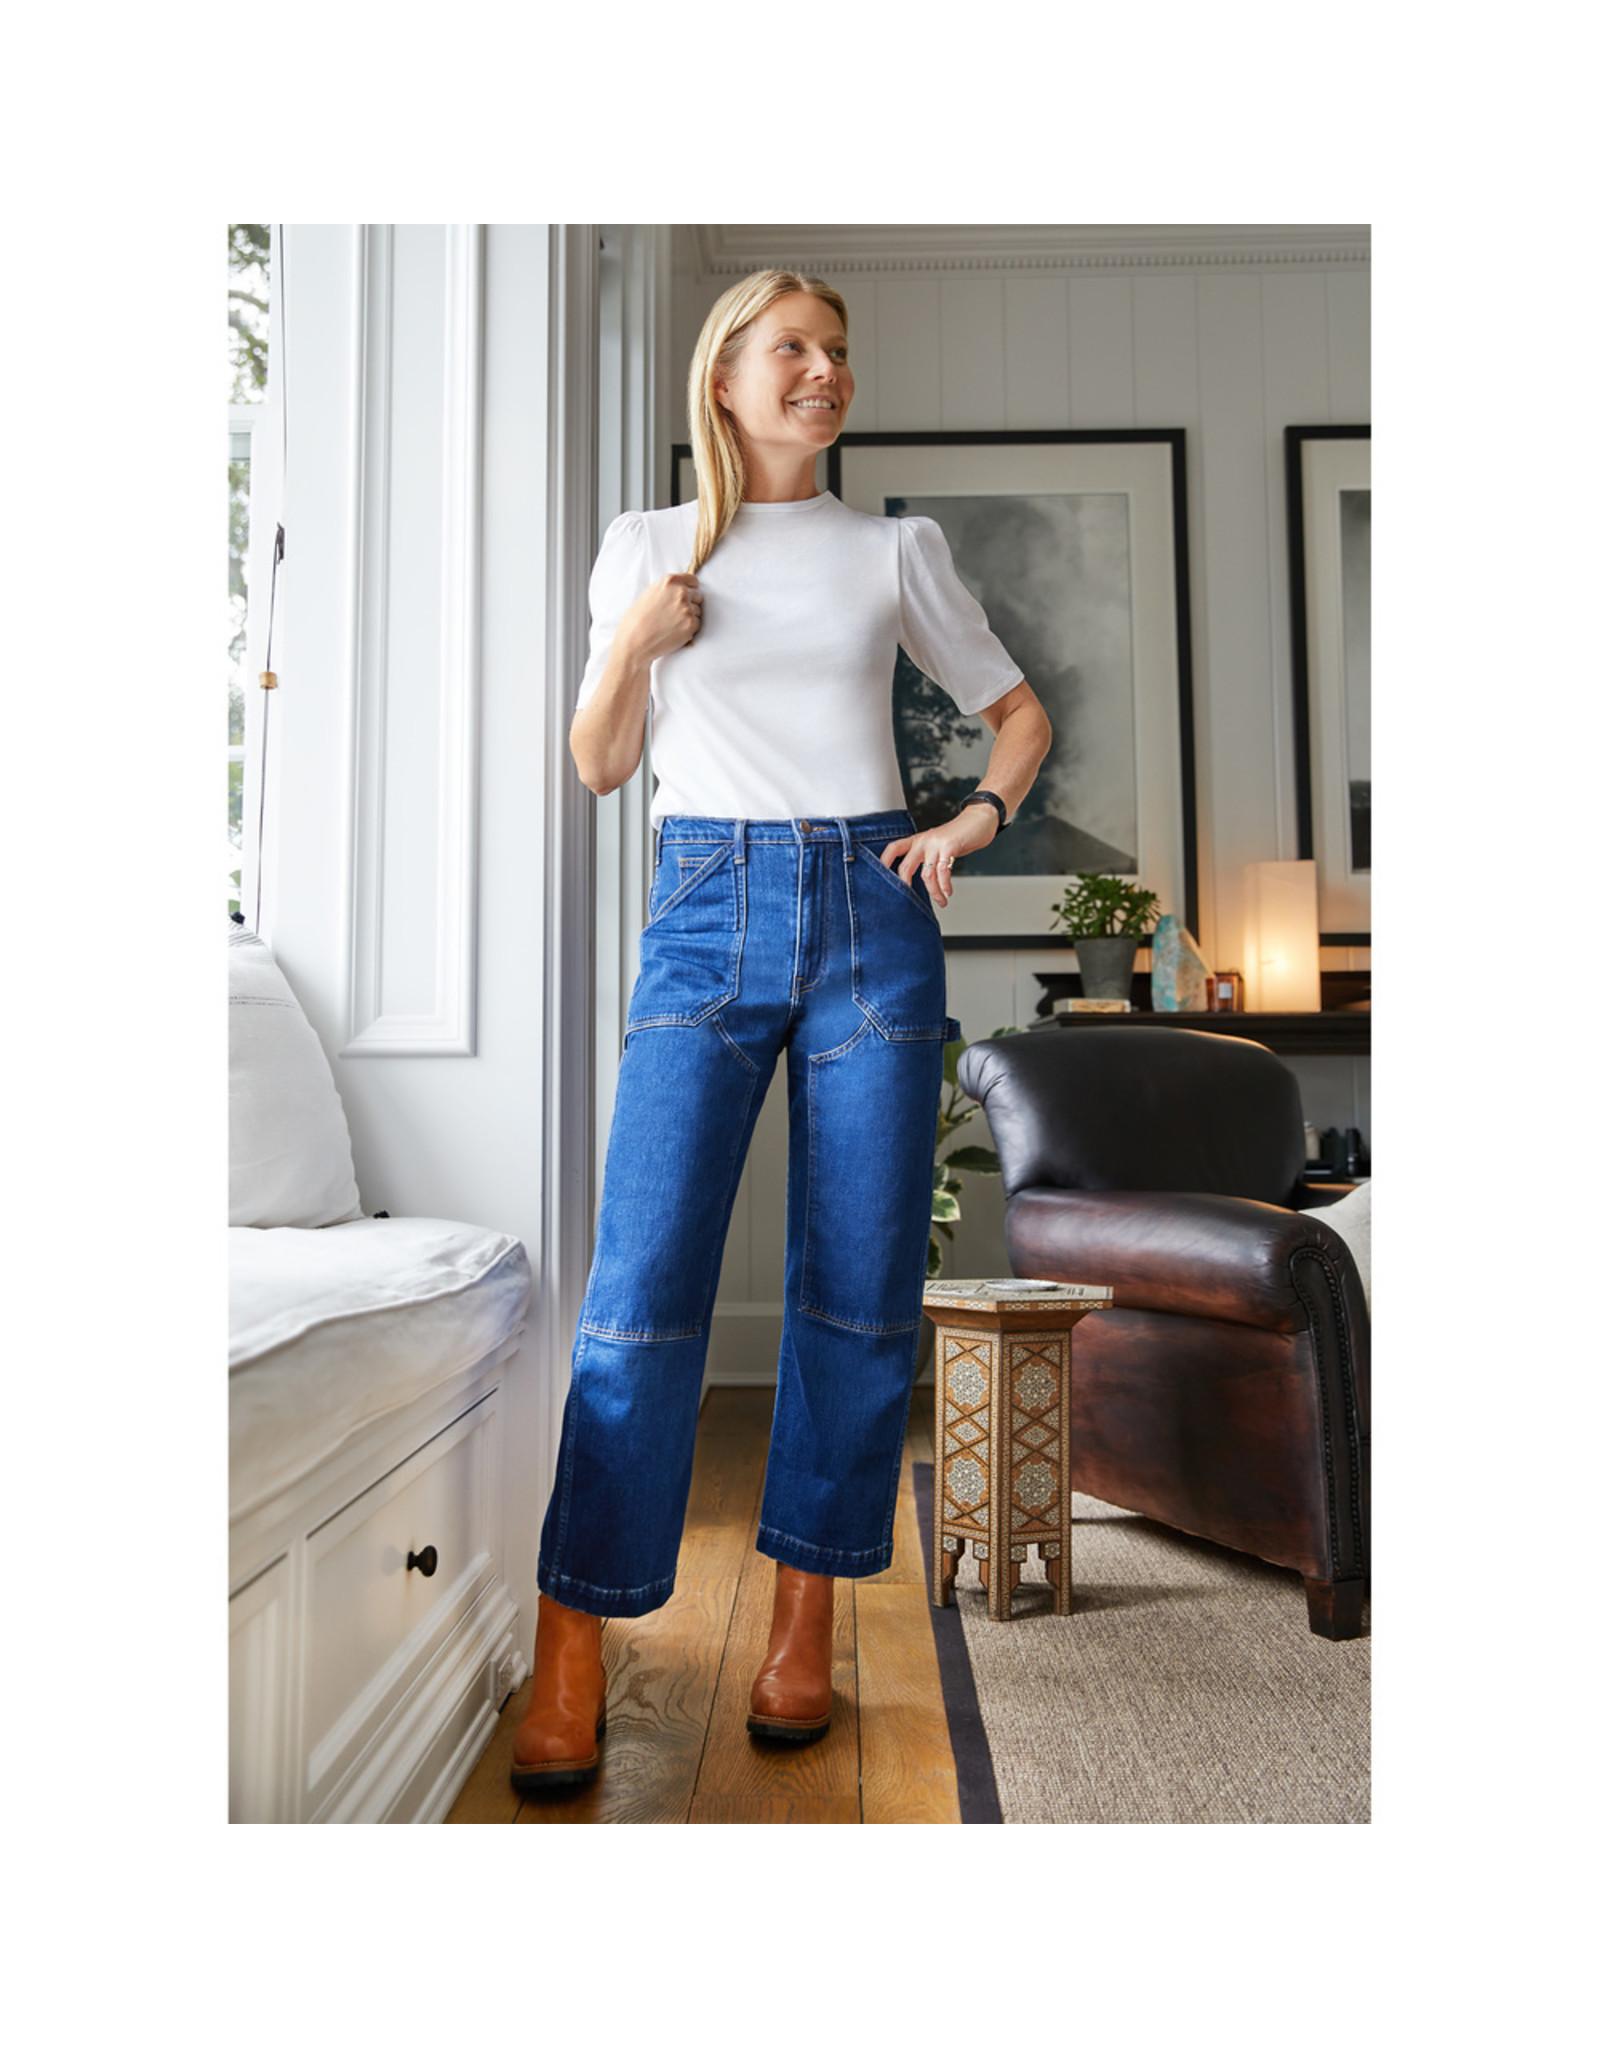 G. Label G. Label JP Workwear Jeans - Medium Blue Wash (Size: 27)